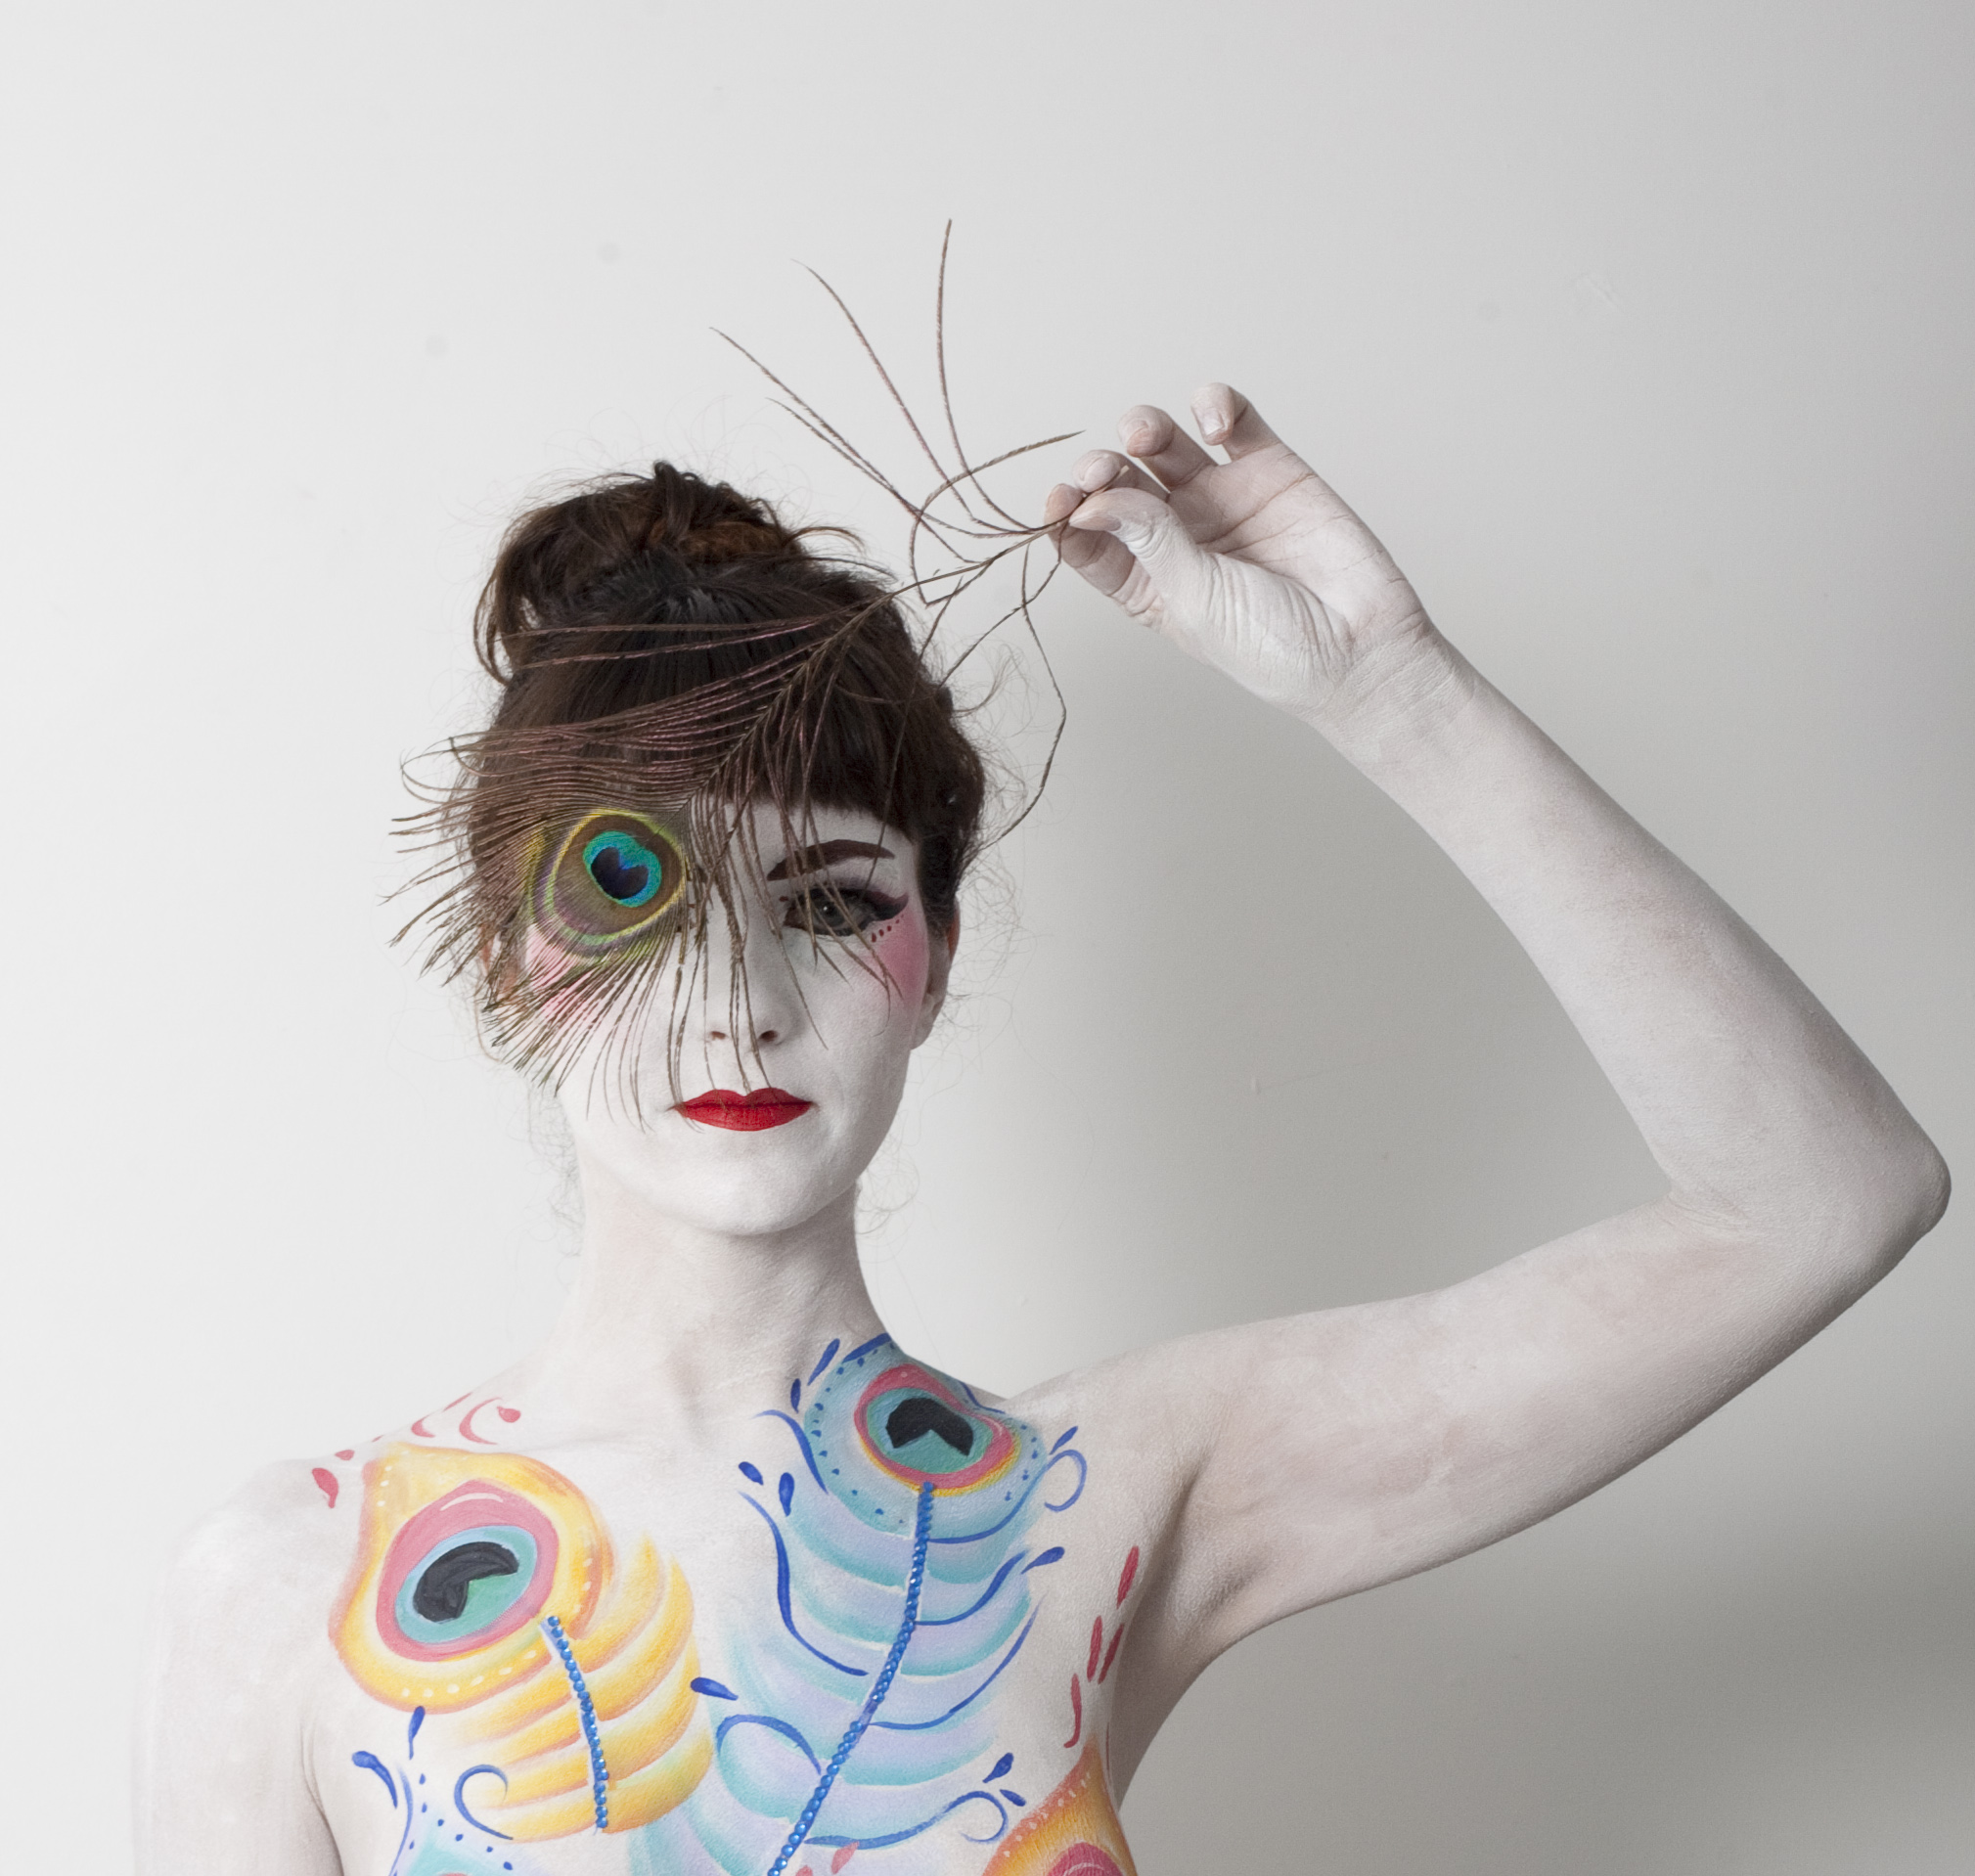 Merryme Body Art